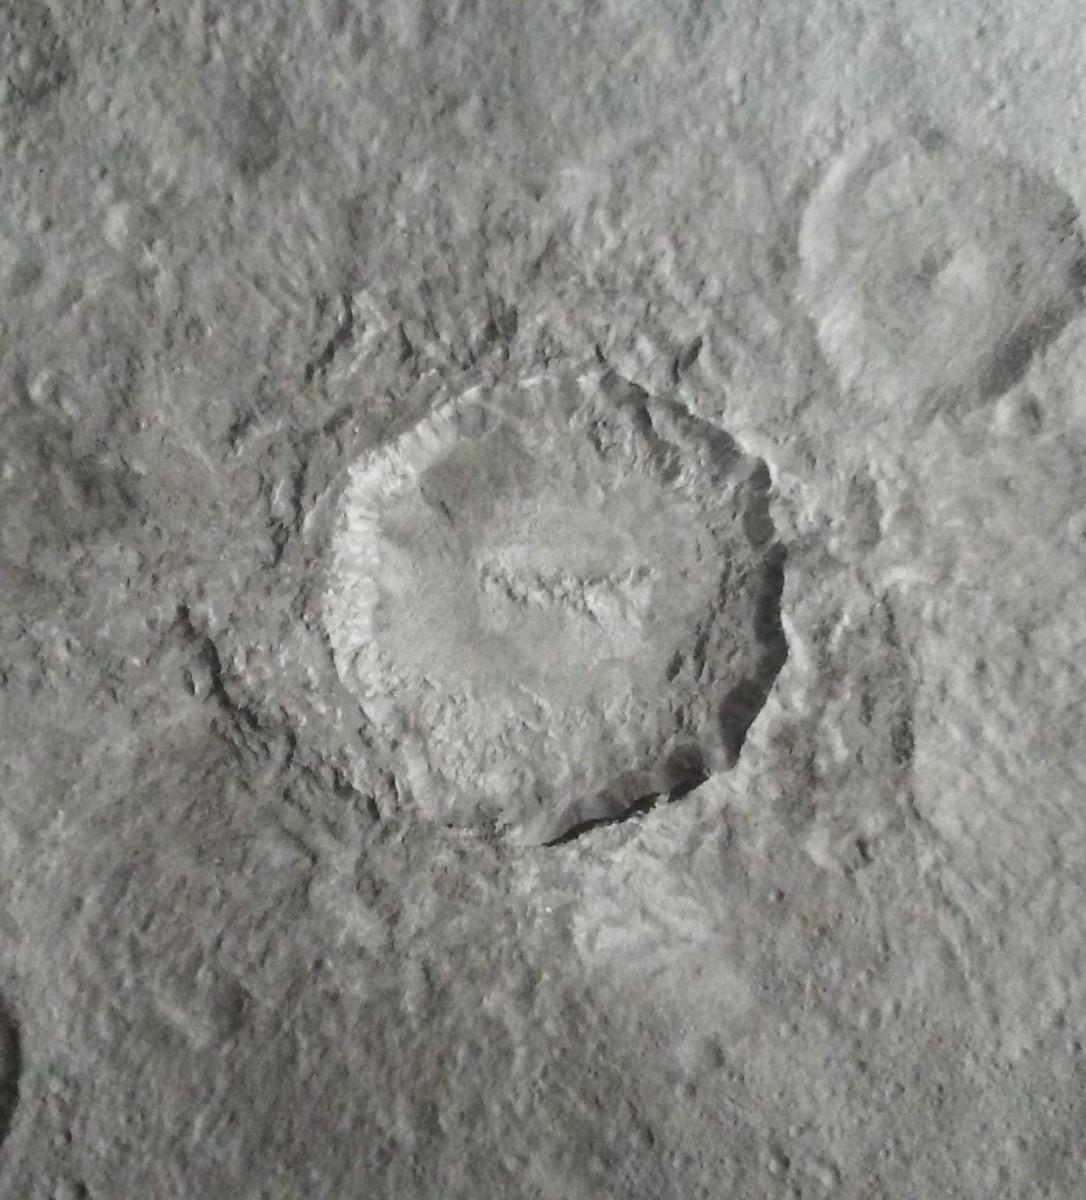 Haulani Crater